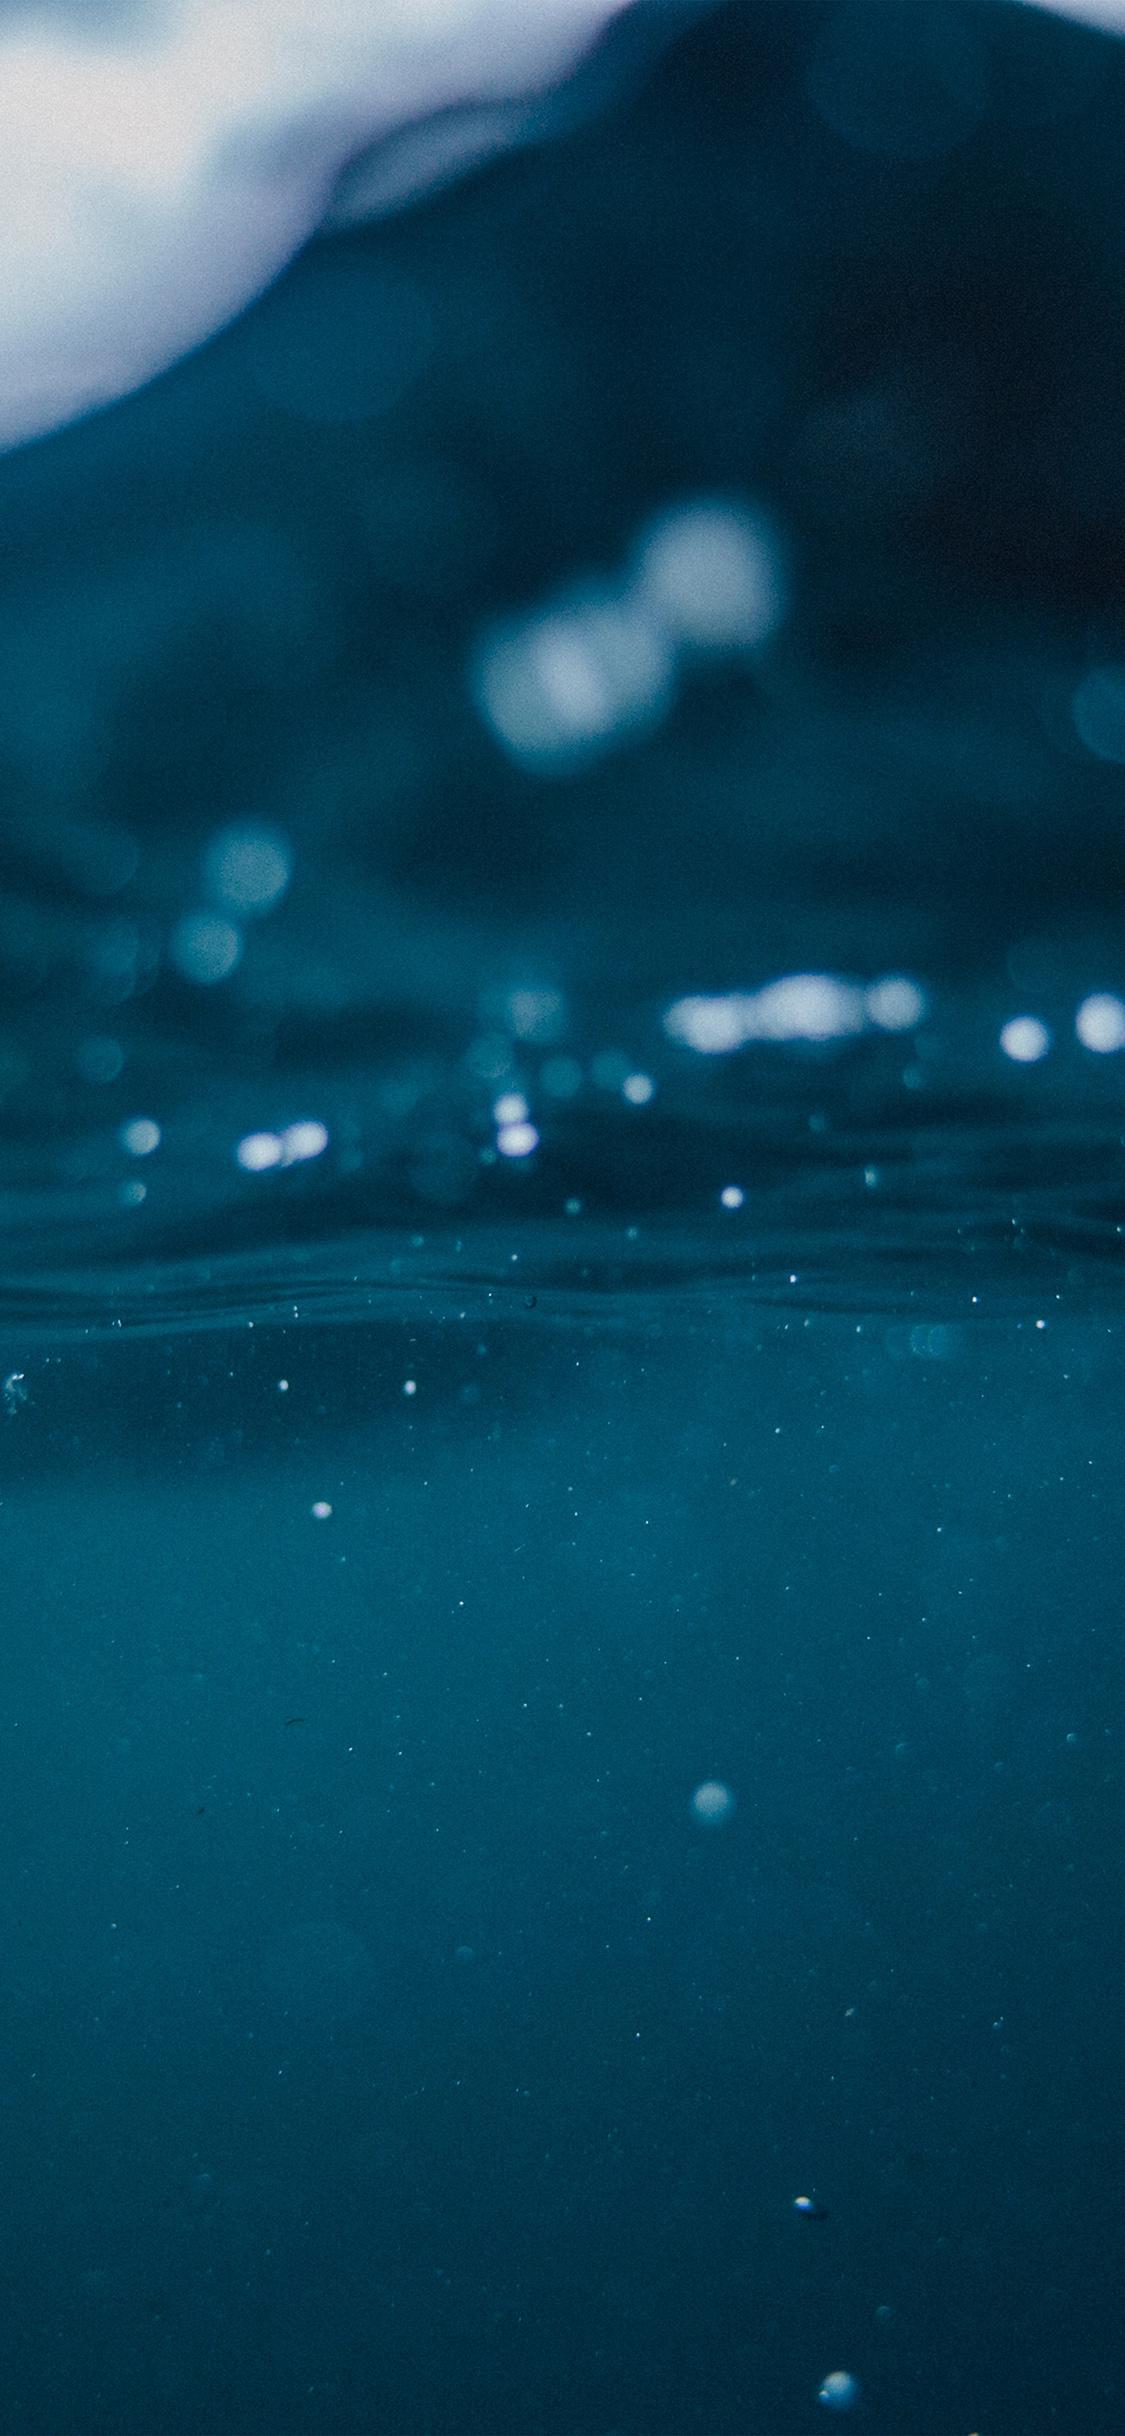 Iphonexpapers Com Iphone X Wallpaper Nm49 Under Water Blue Ocean